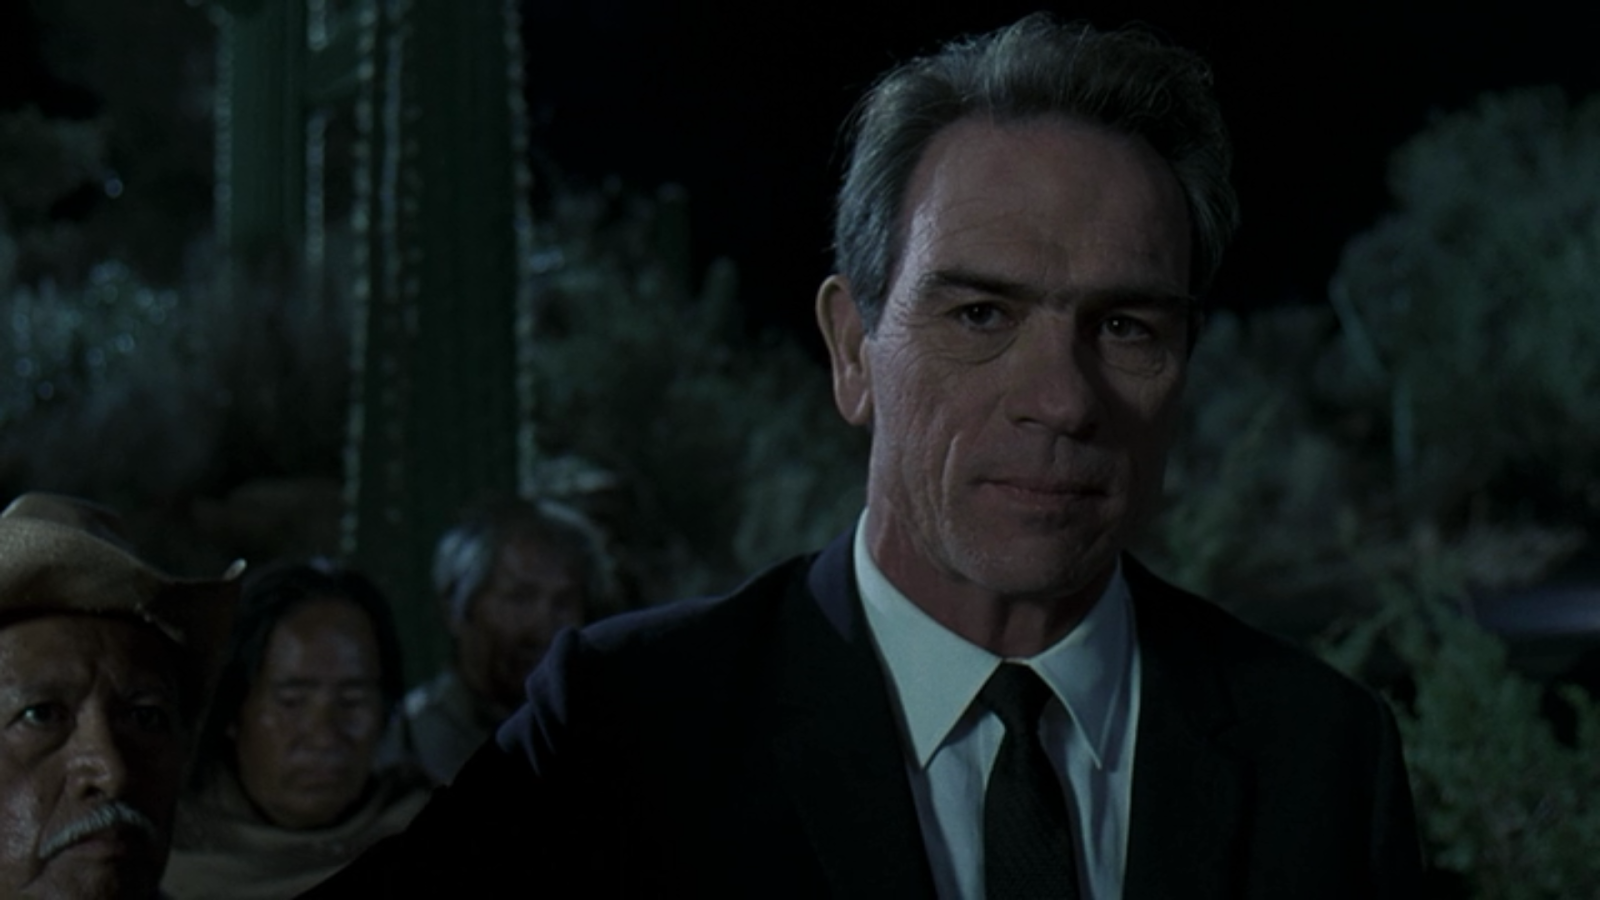 Movie Men in Black (1997) - Adventures of Me